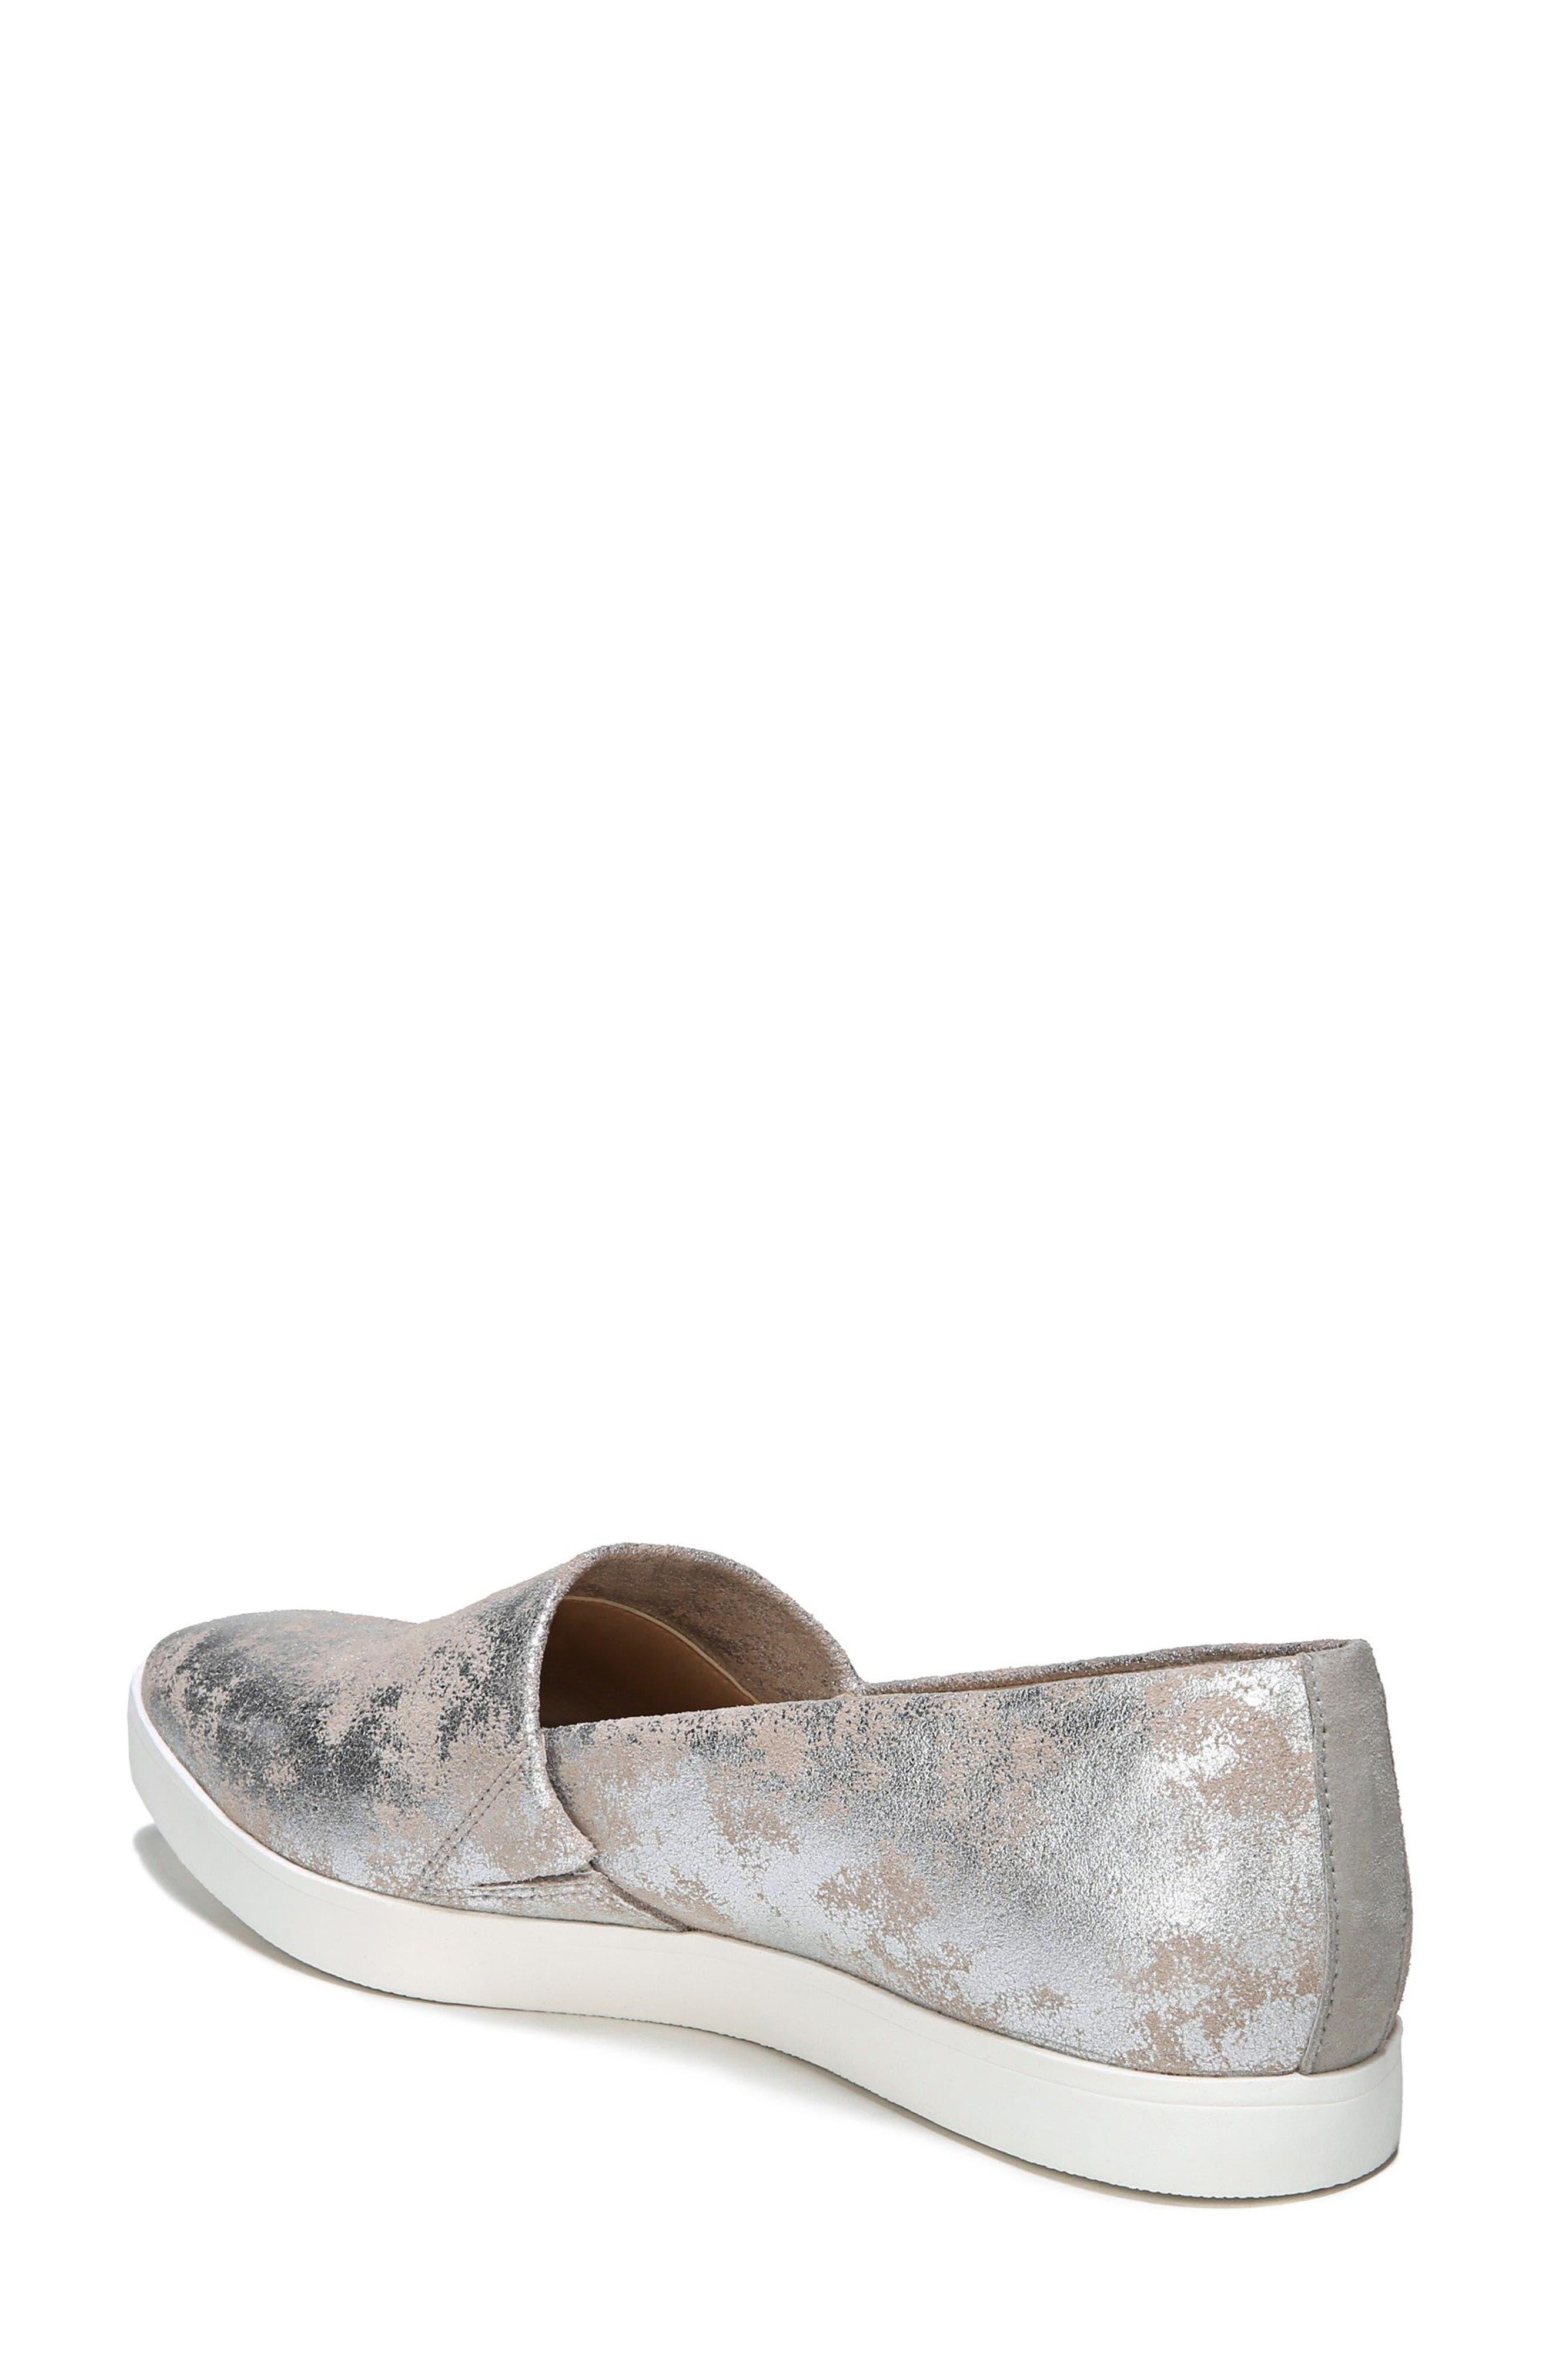 DR. SCHOLL'S, 'Vienna' Slip-on Sneaker, Alternate thumbnail 2, color, 040